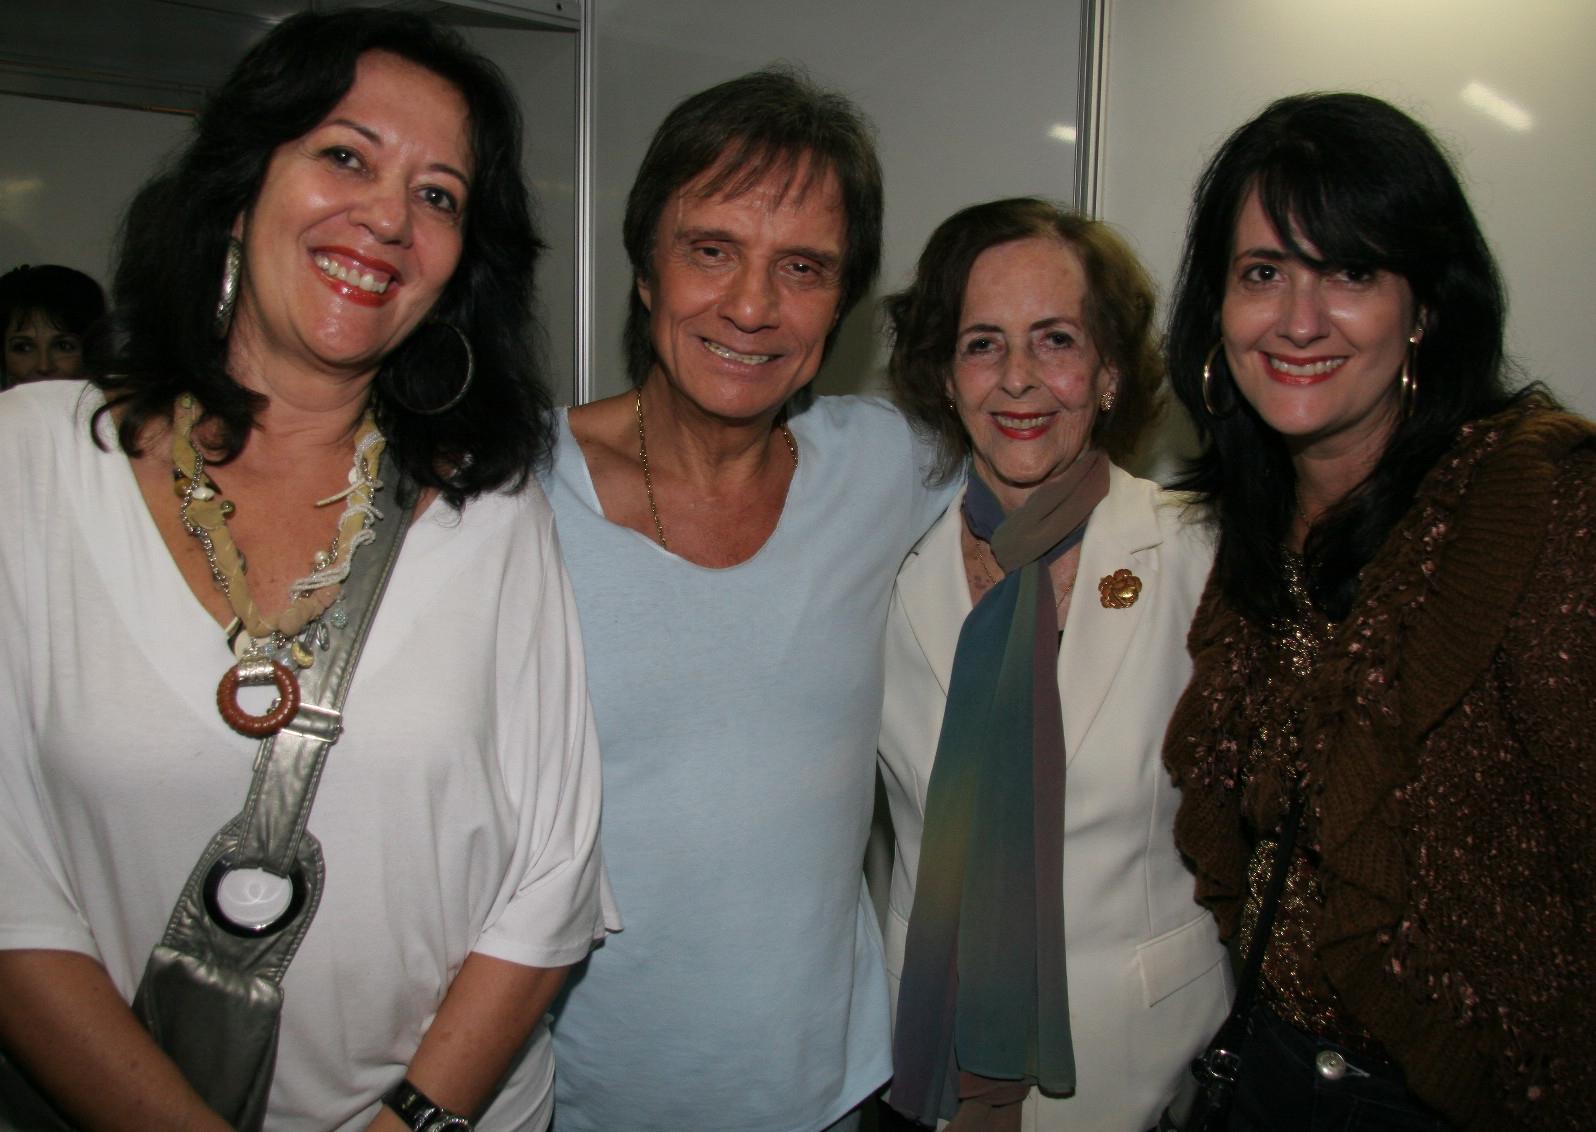 Helena Mignone, Marilena e Marialice